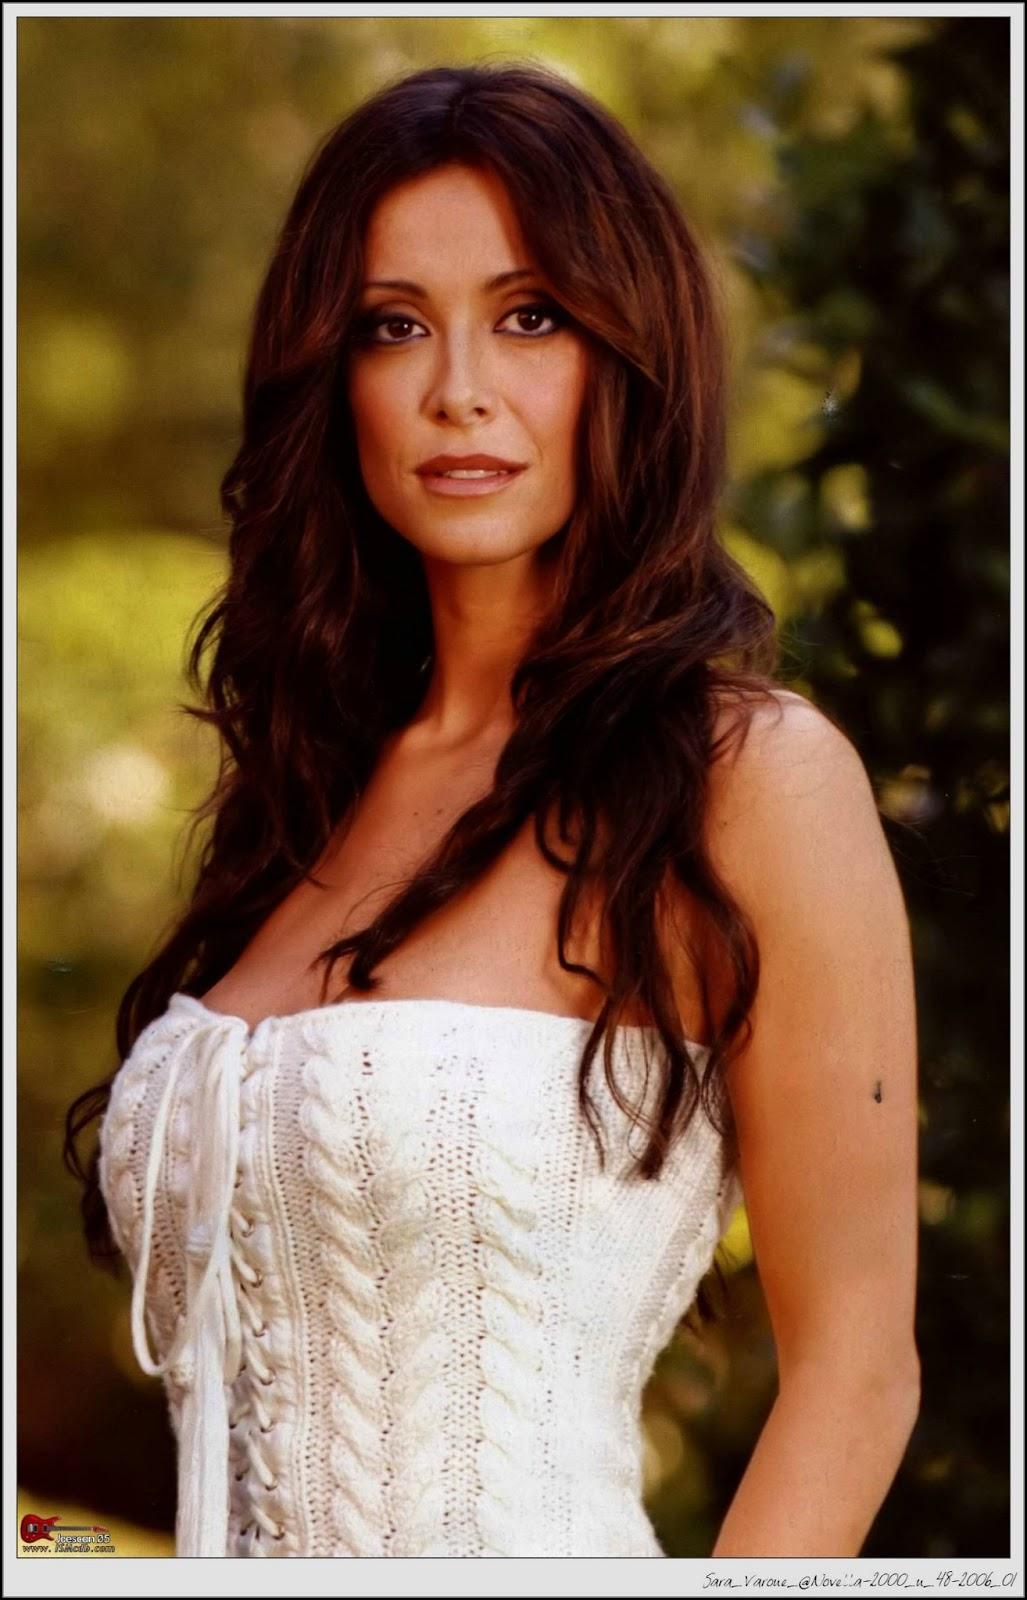 Italian Busty MILF Sara Varone | The Hottes